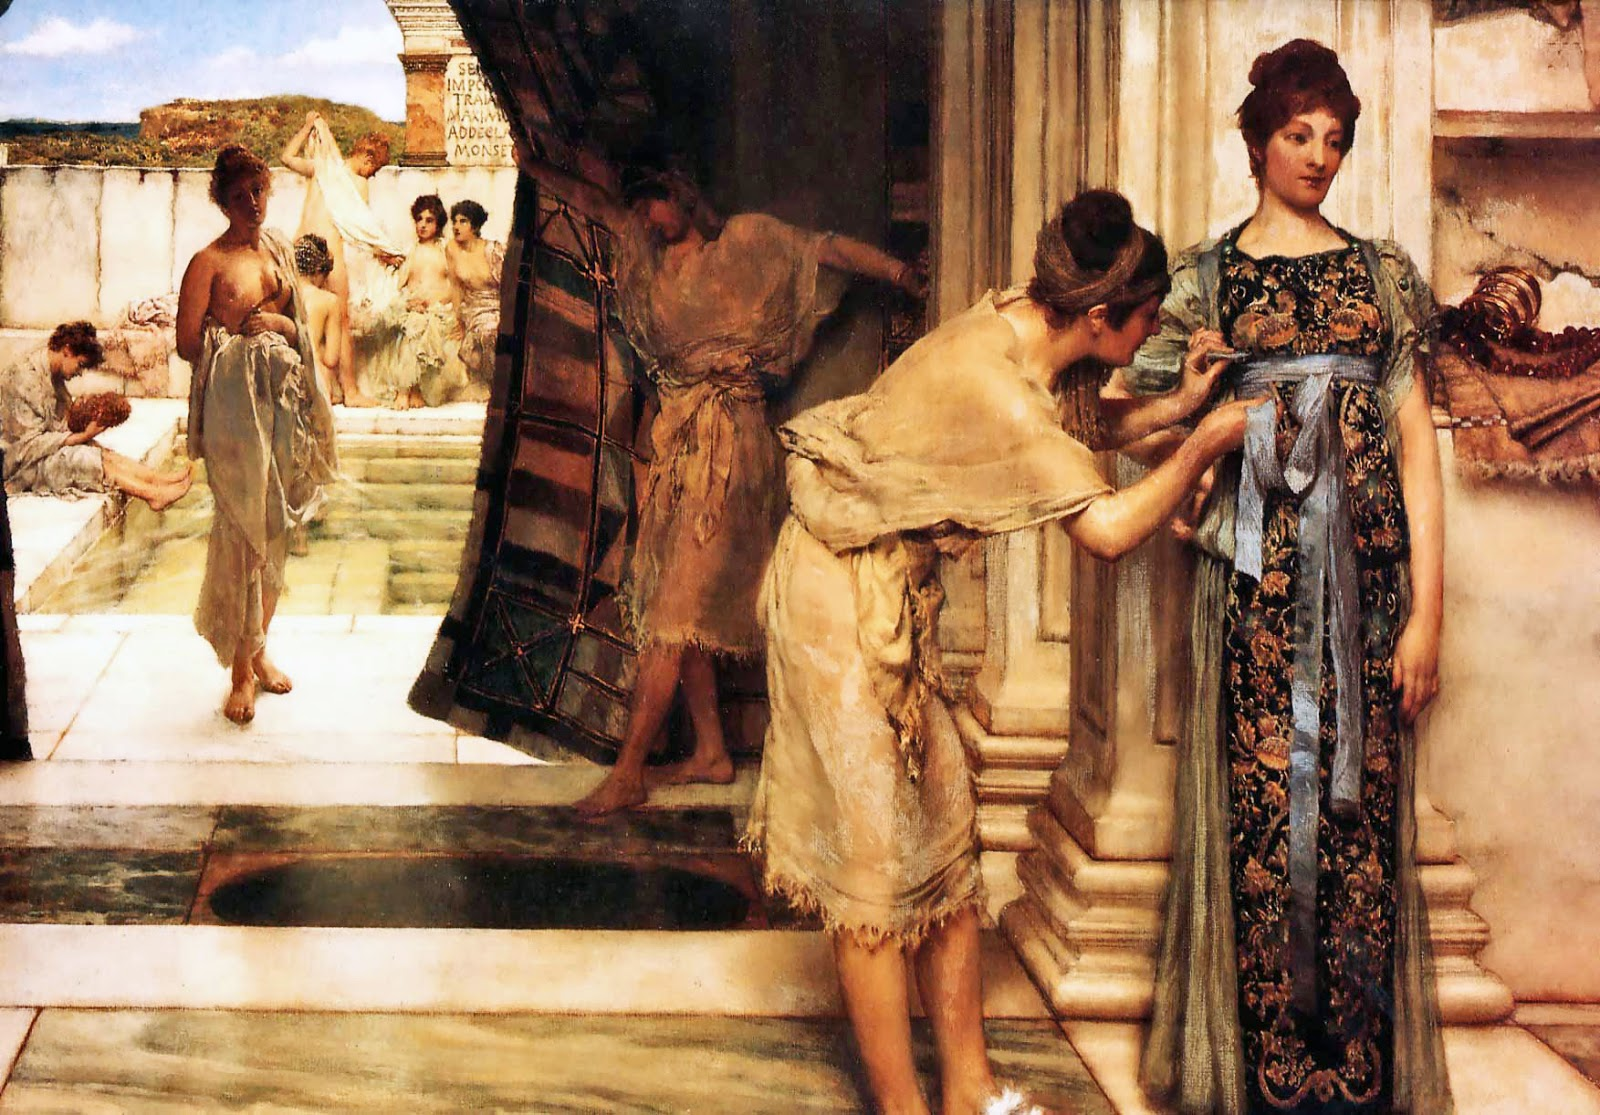 Lawrence Alma-Tadema - Page 2 Sir+Lawrence+Alma-Tadema+-+The+Frigidarium